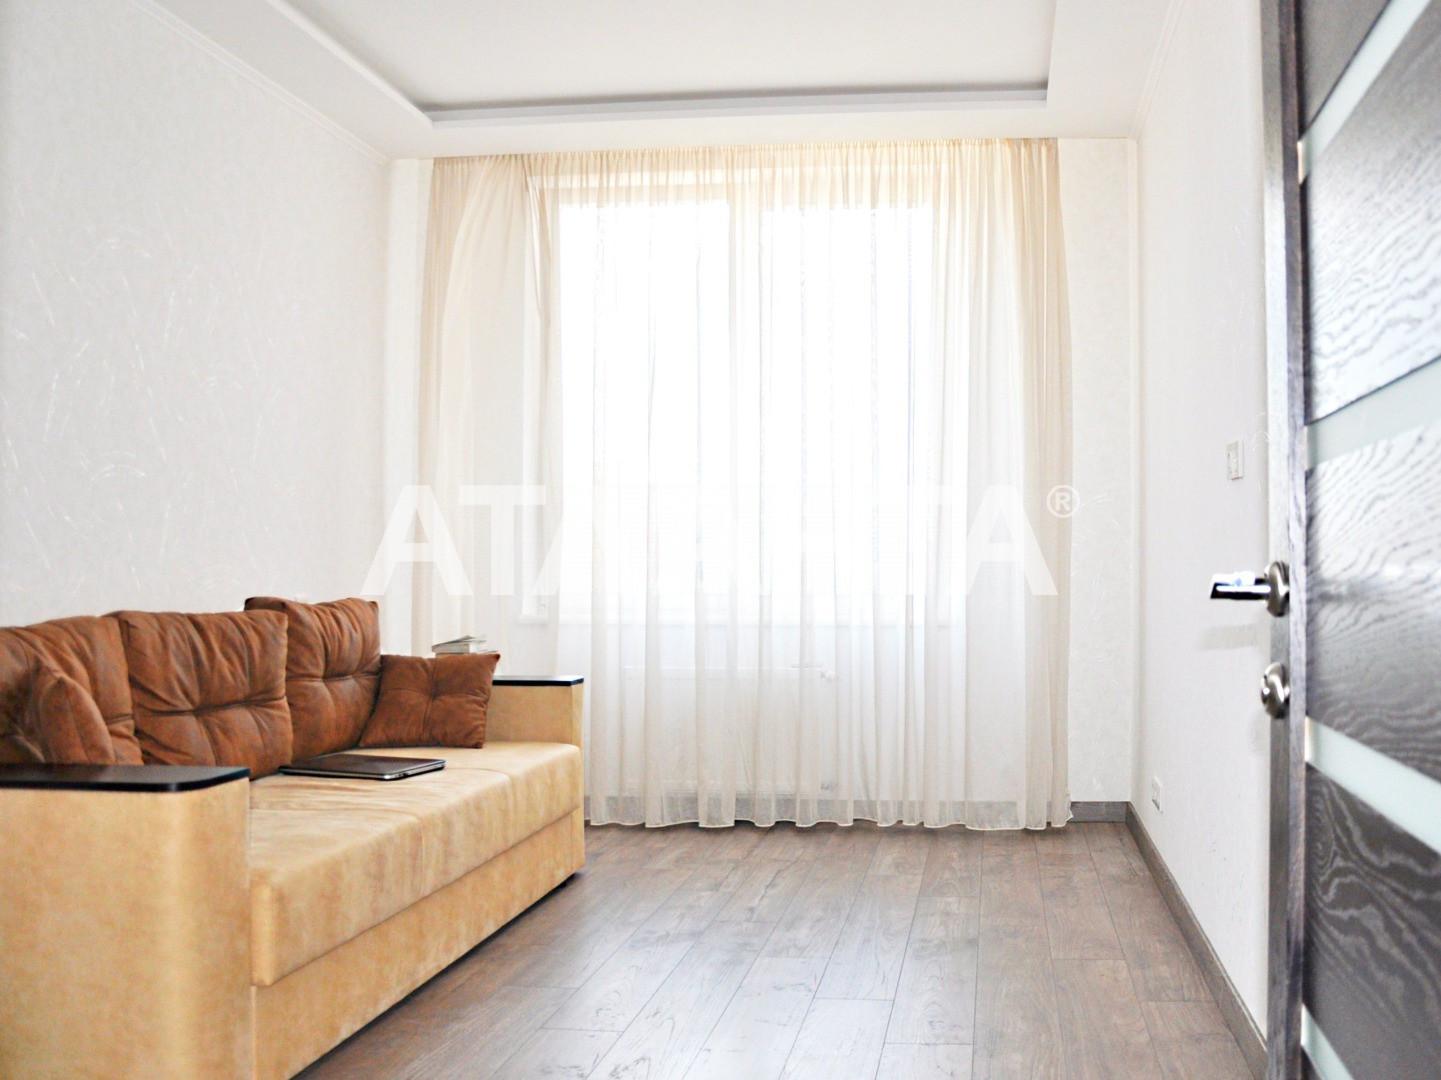 Продается 2-комнатная Квартира на ул. Генуэзская — 130 000 у.е. (фото №5)